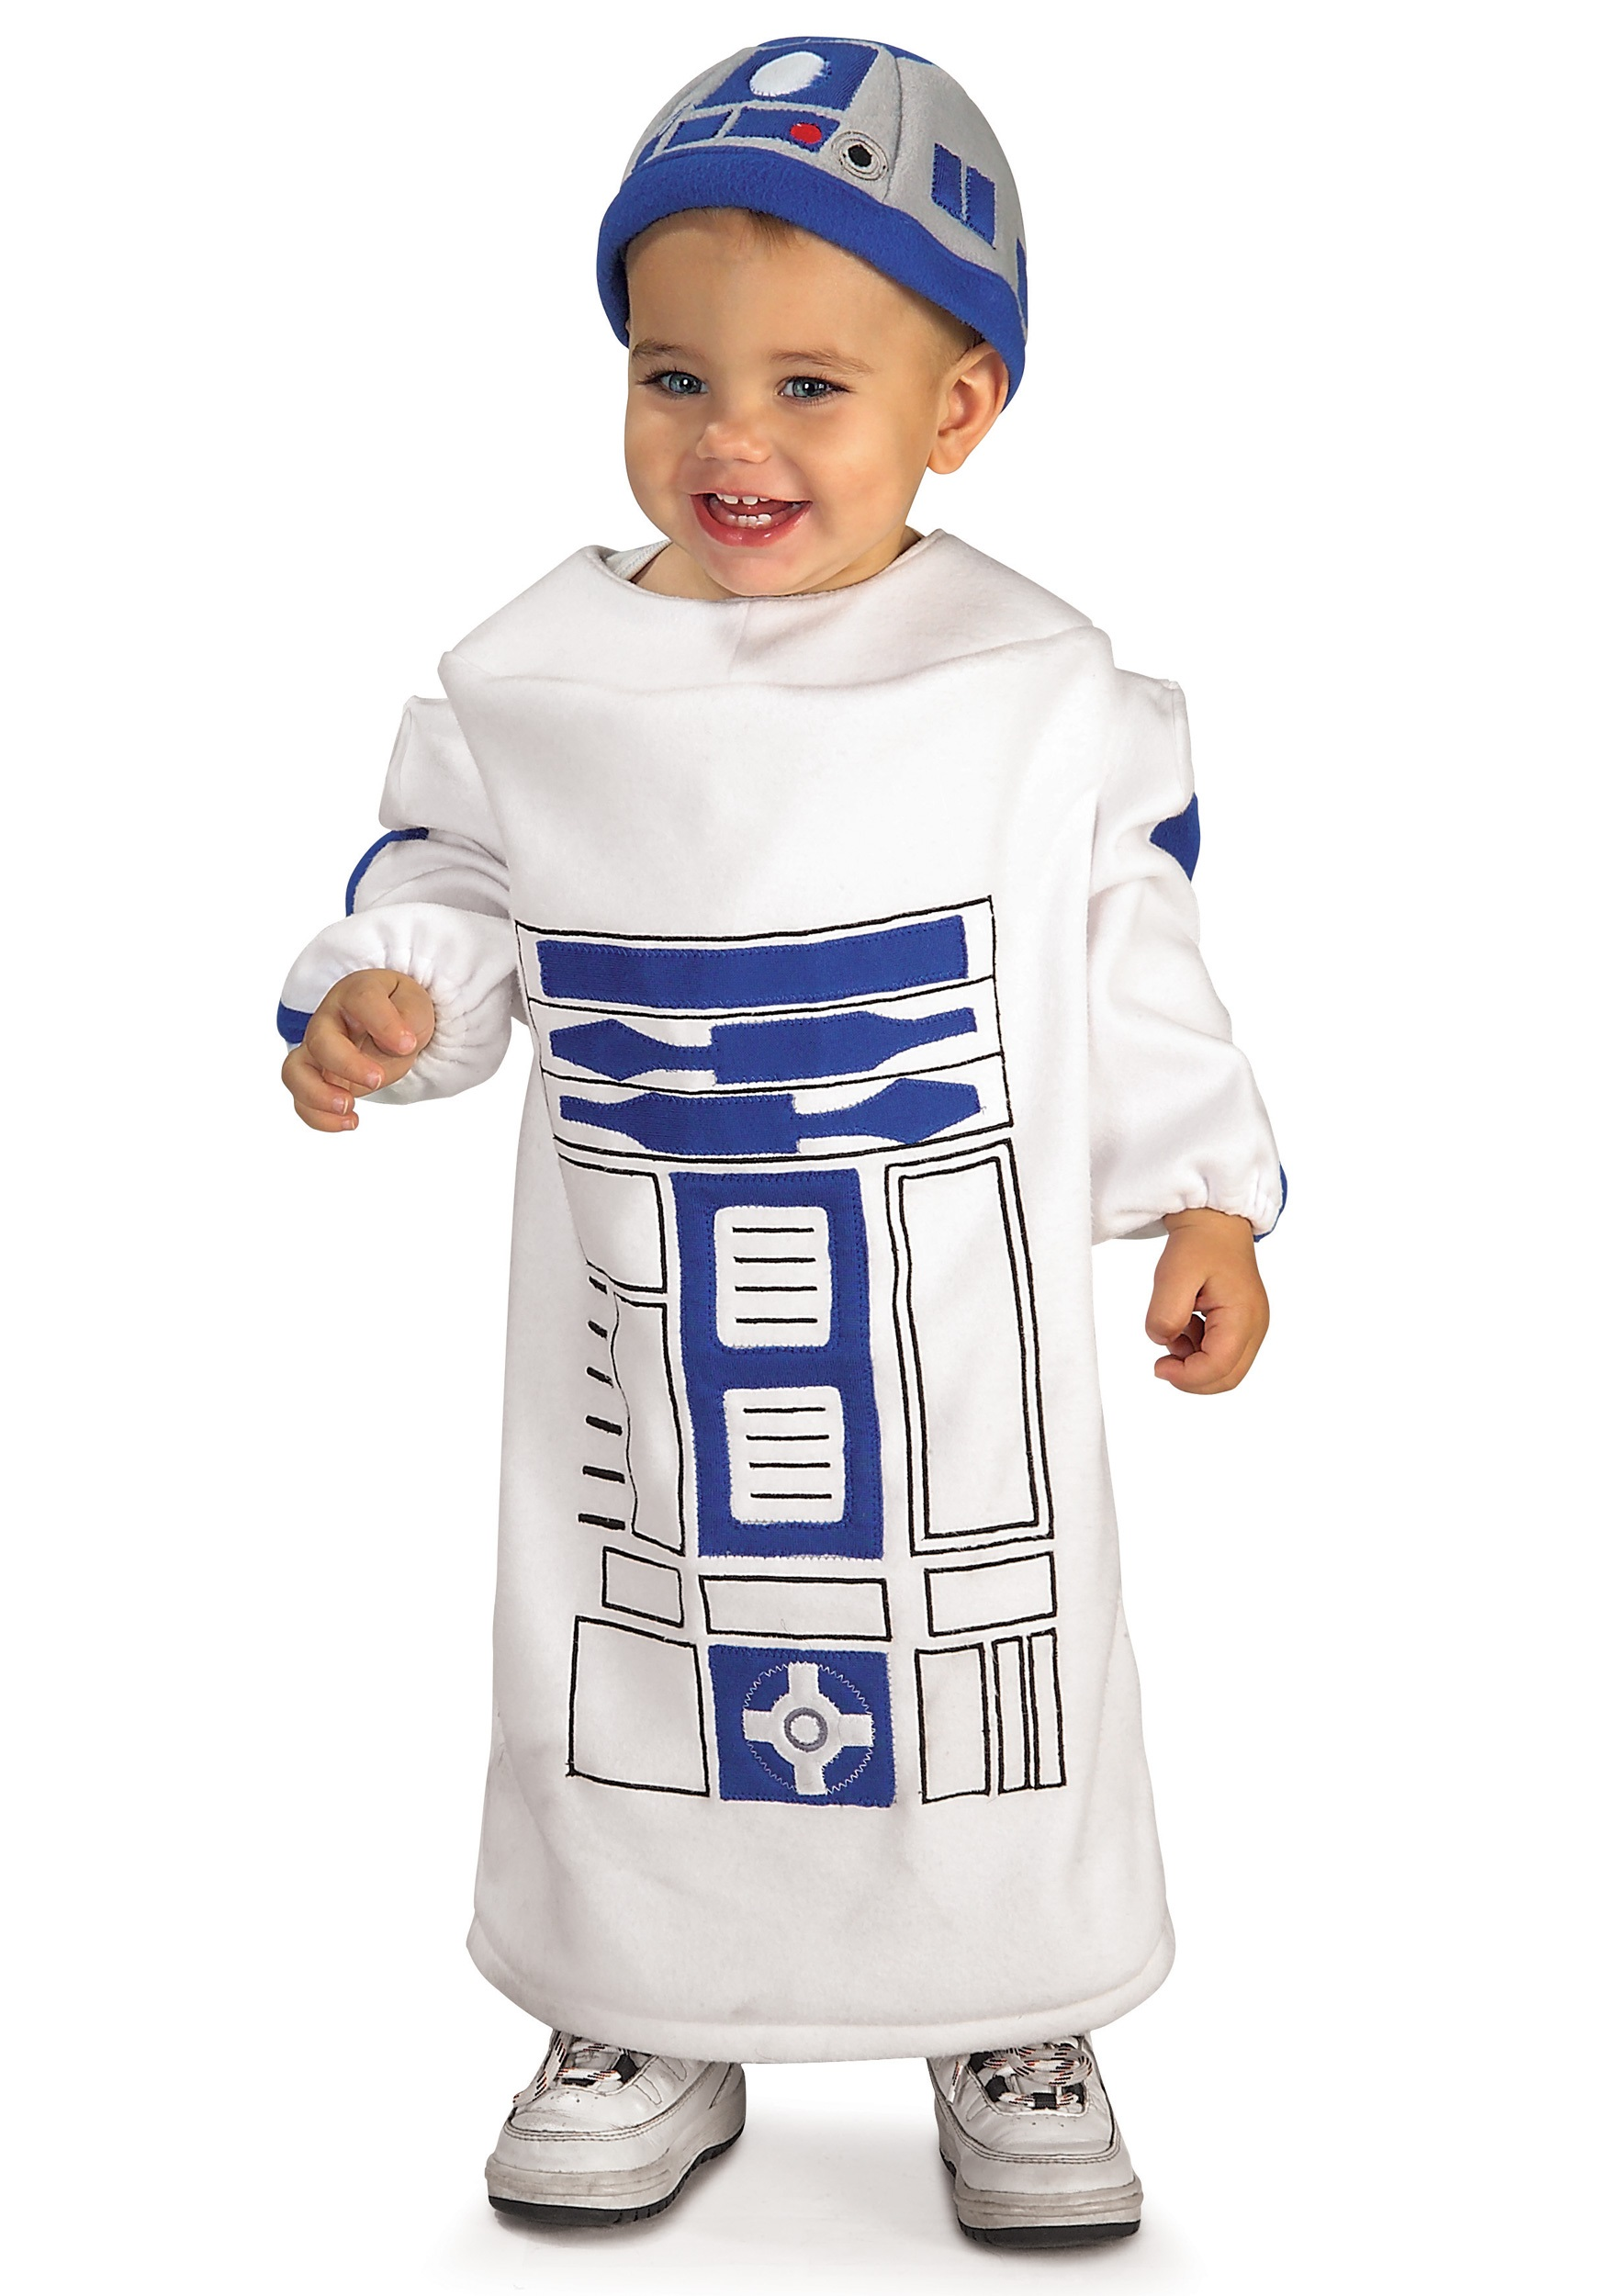 Ihram Kids For Sale Dubai: Infant R2D2 Costume